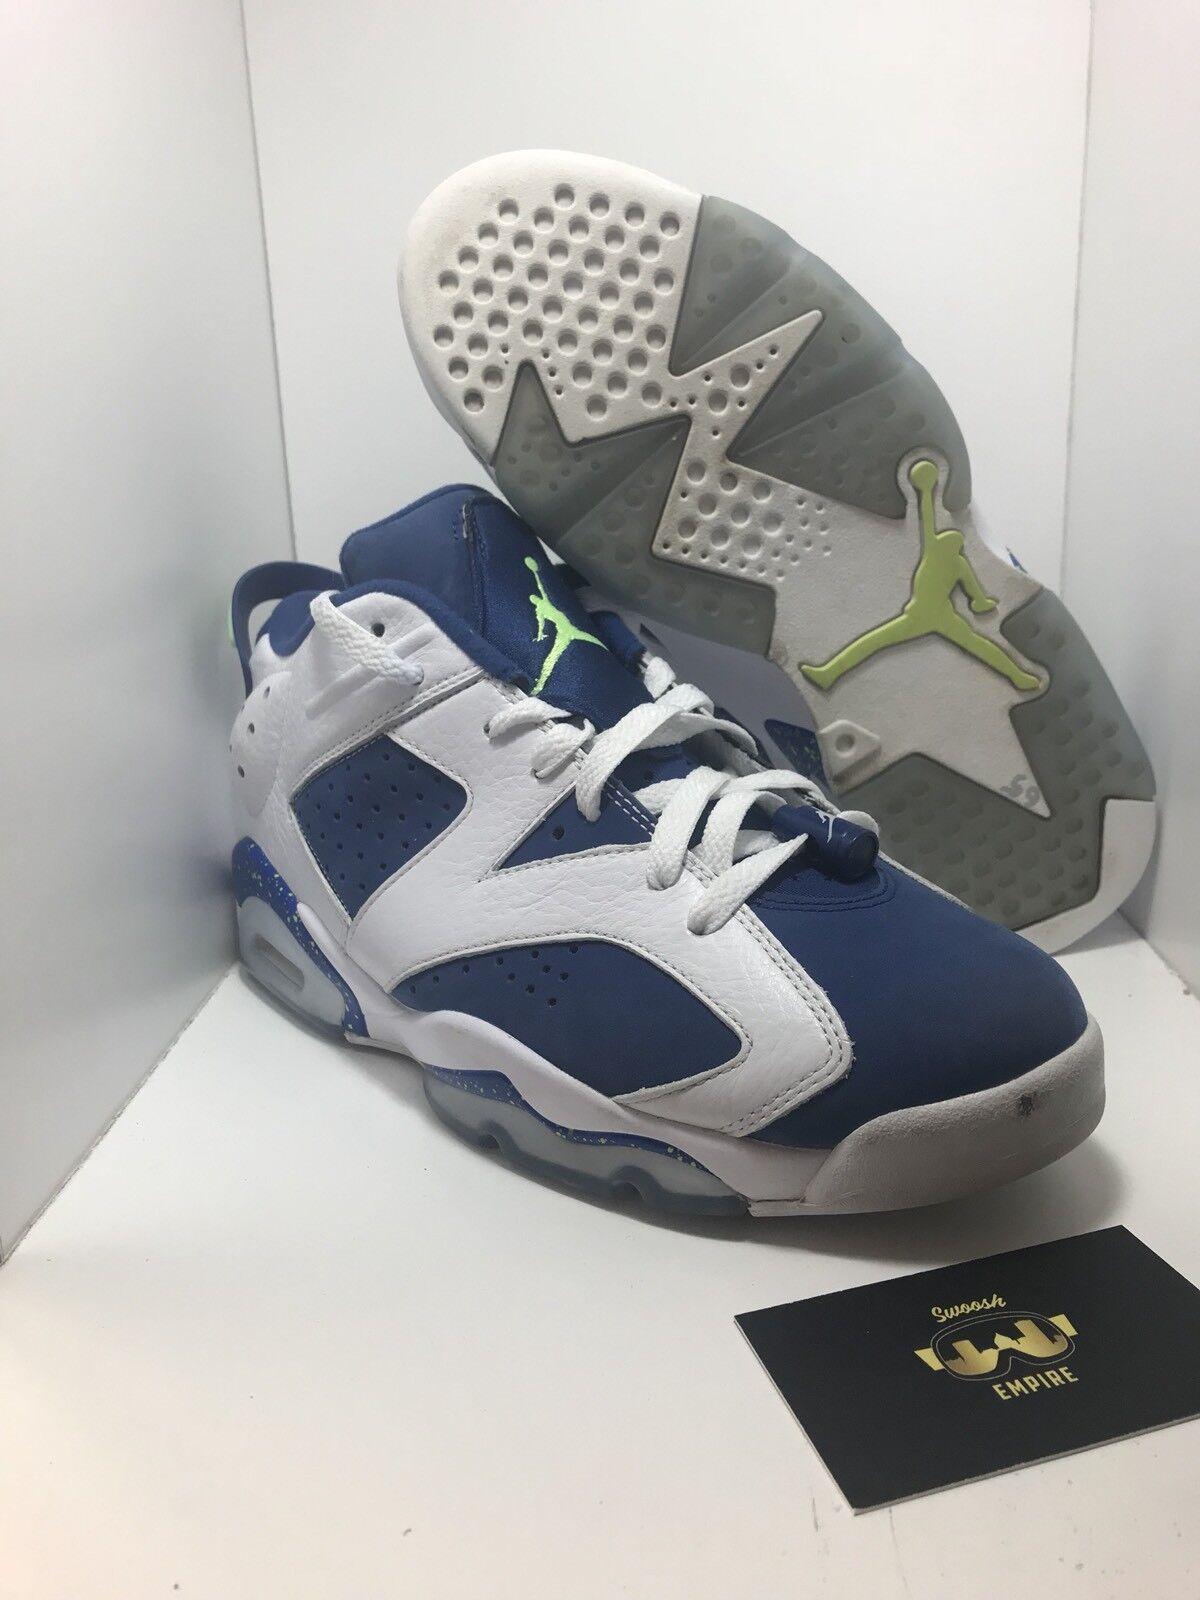 Nike Air Jordan 6 Retro Low Ghost Green Seahawks Size 9 304401-106 Great Shape